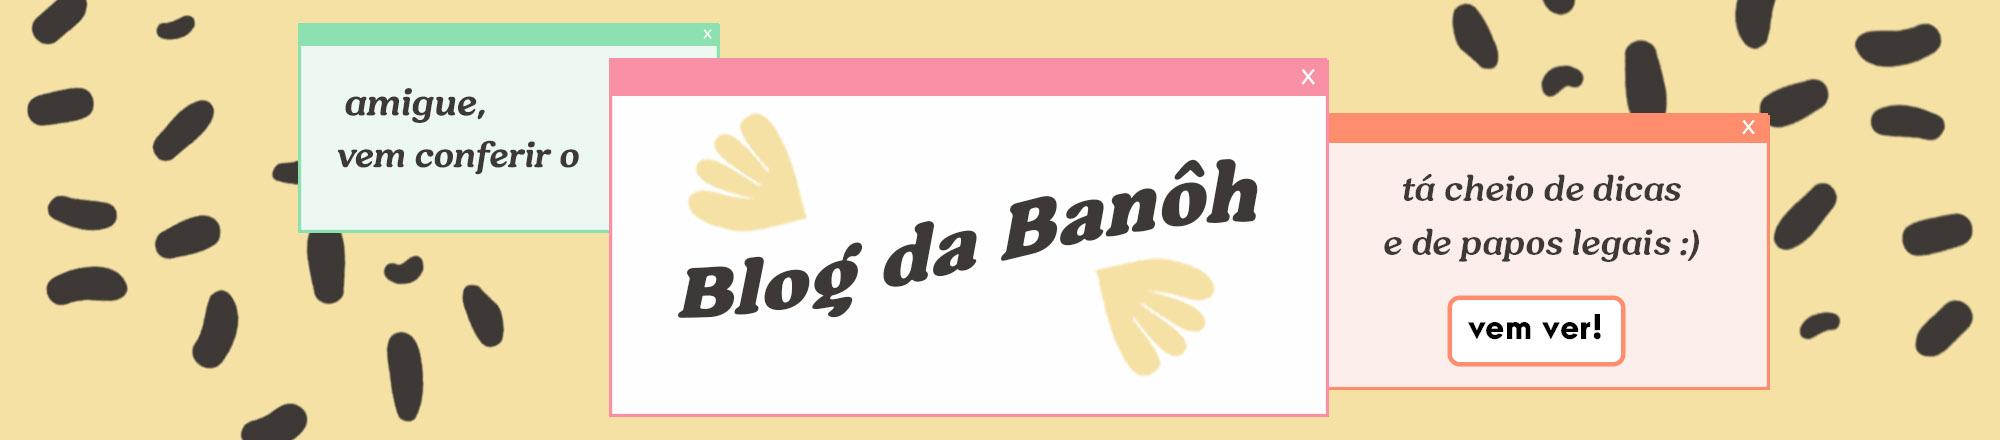 Banner 4 - blog da banôh